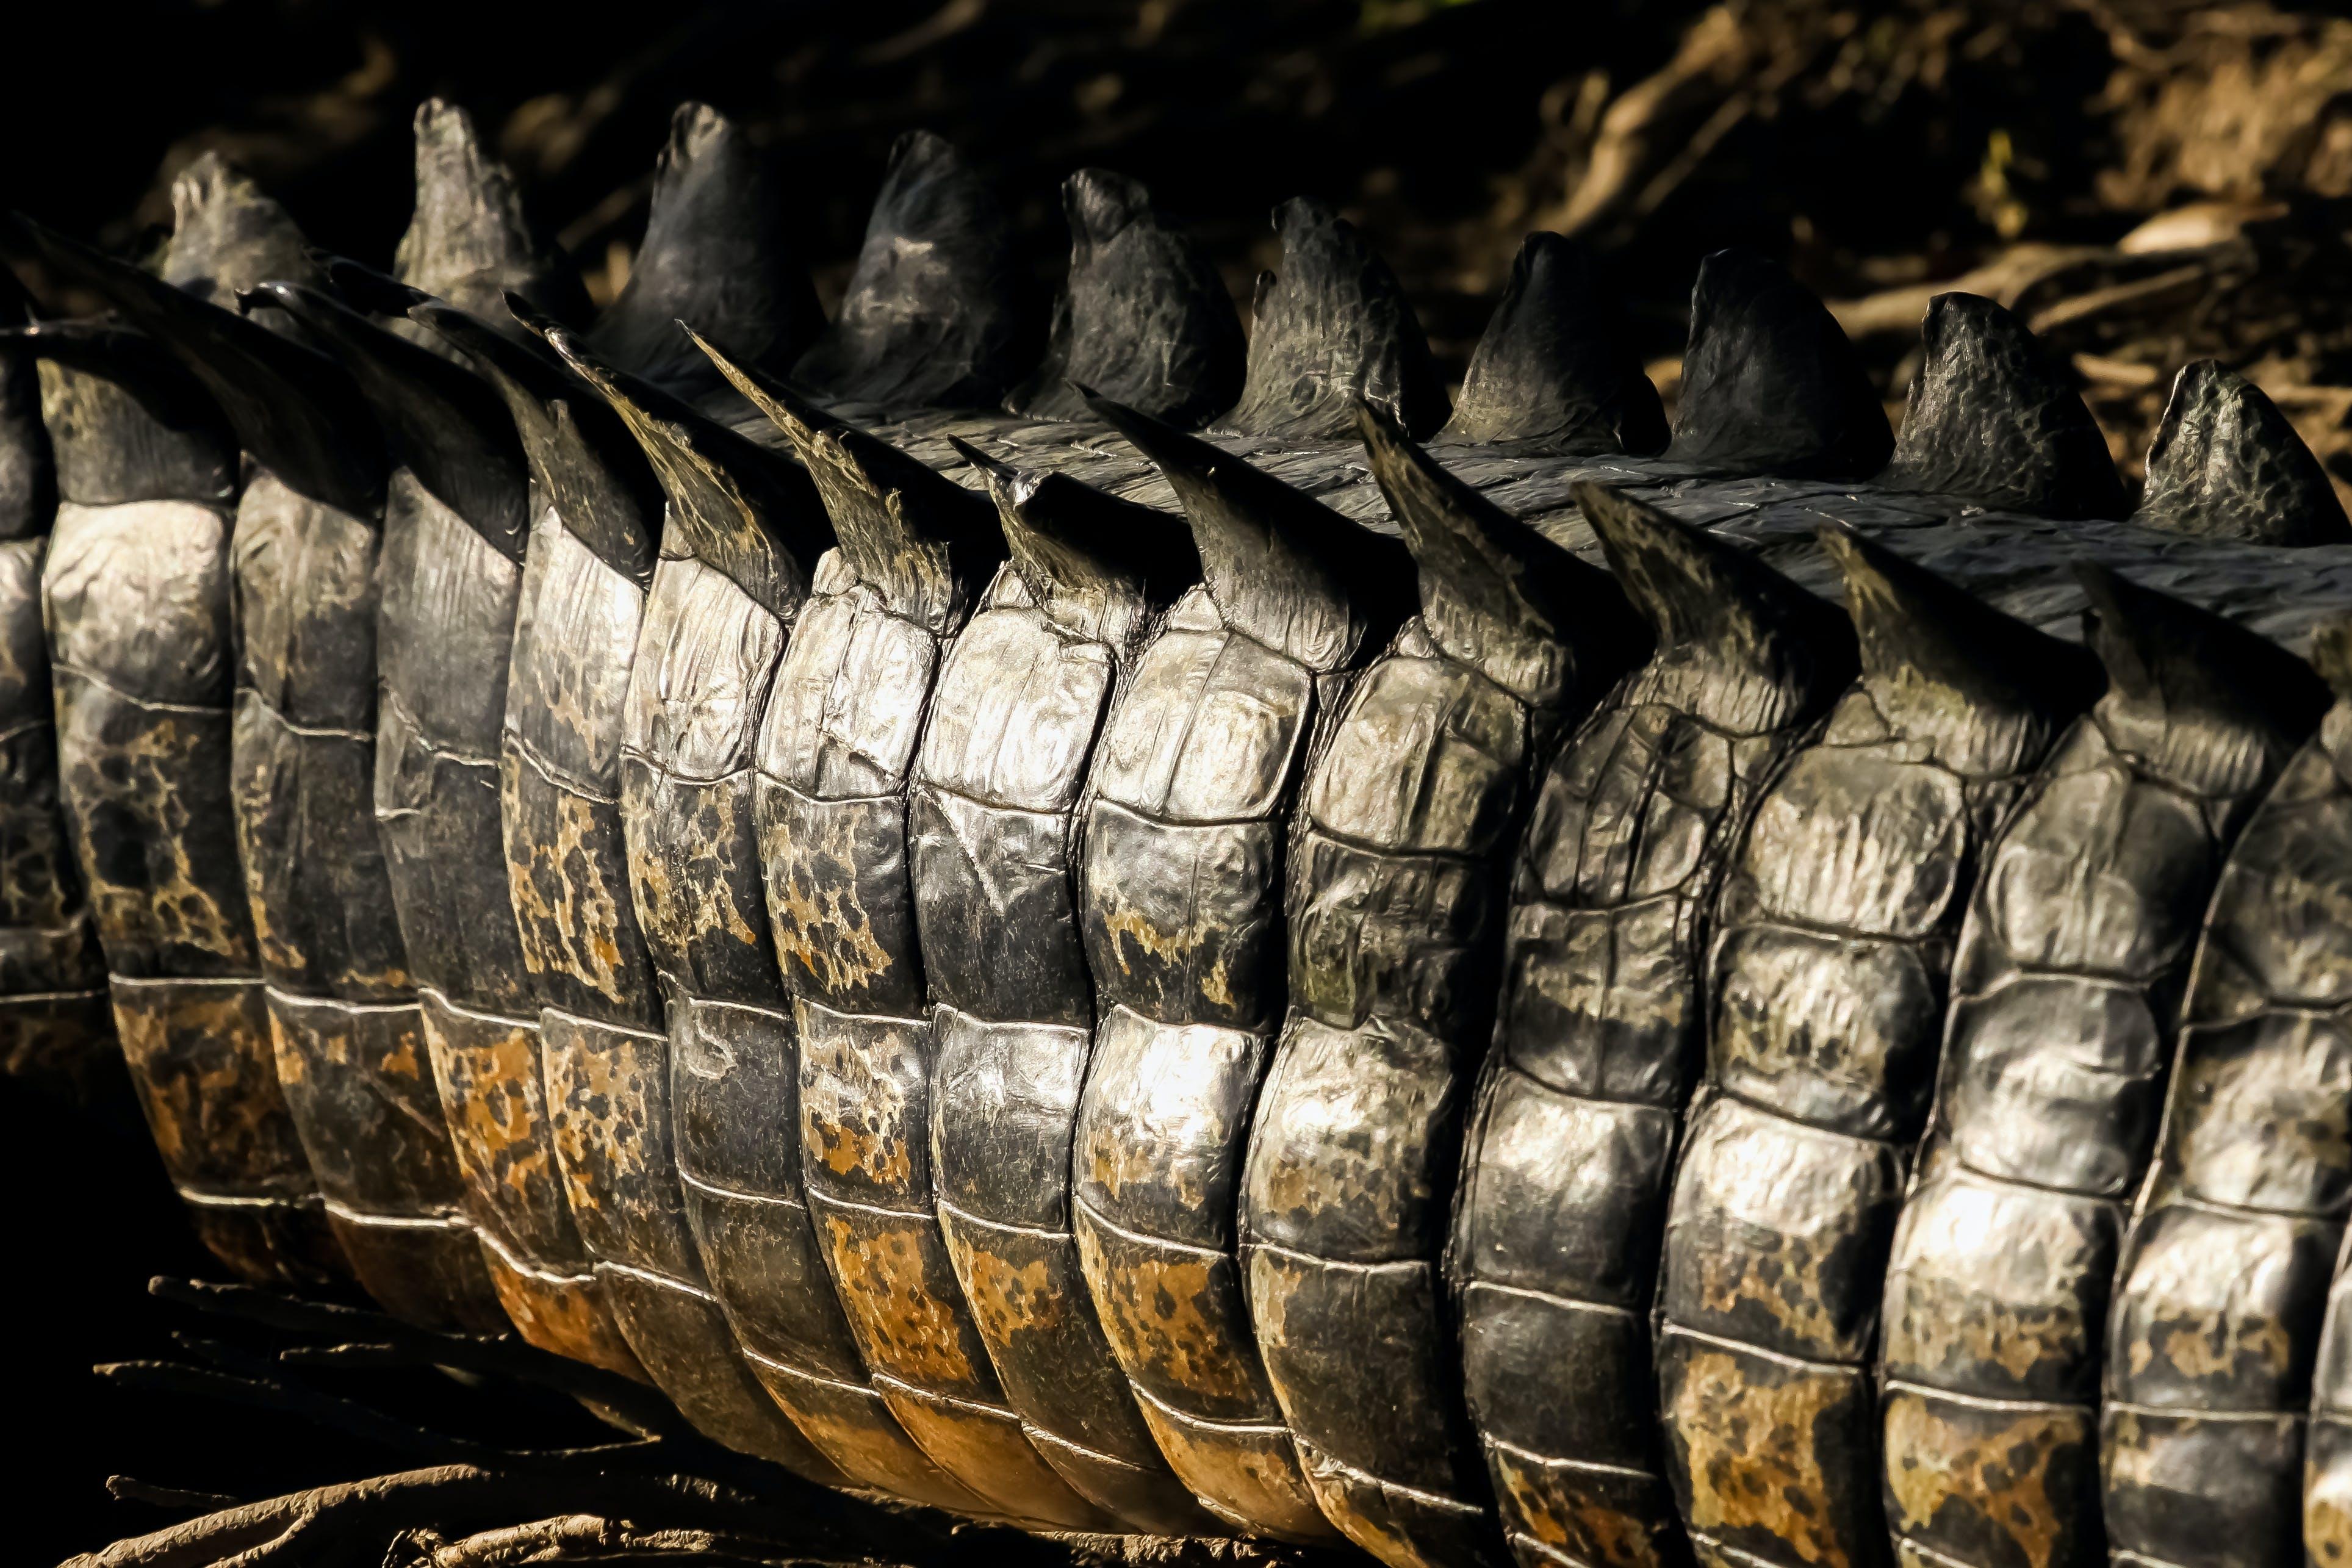 Krokodil heeft de krachtigste kaken